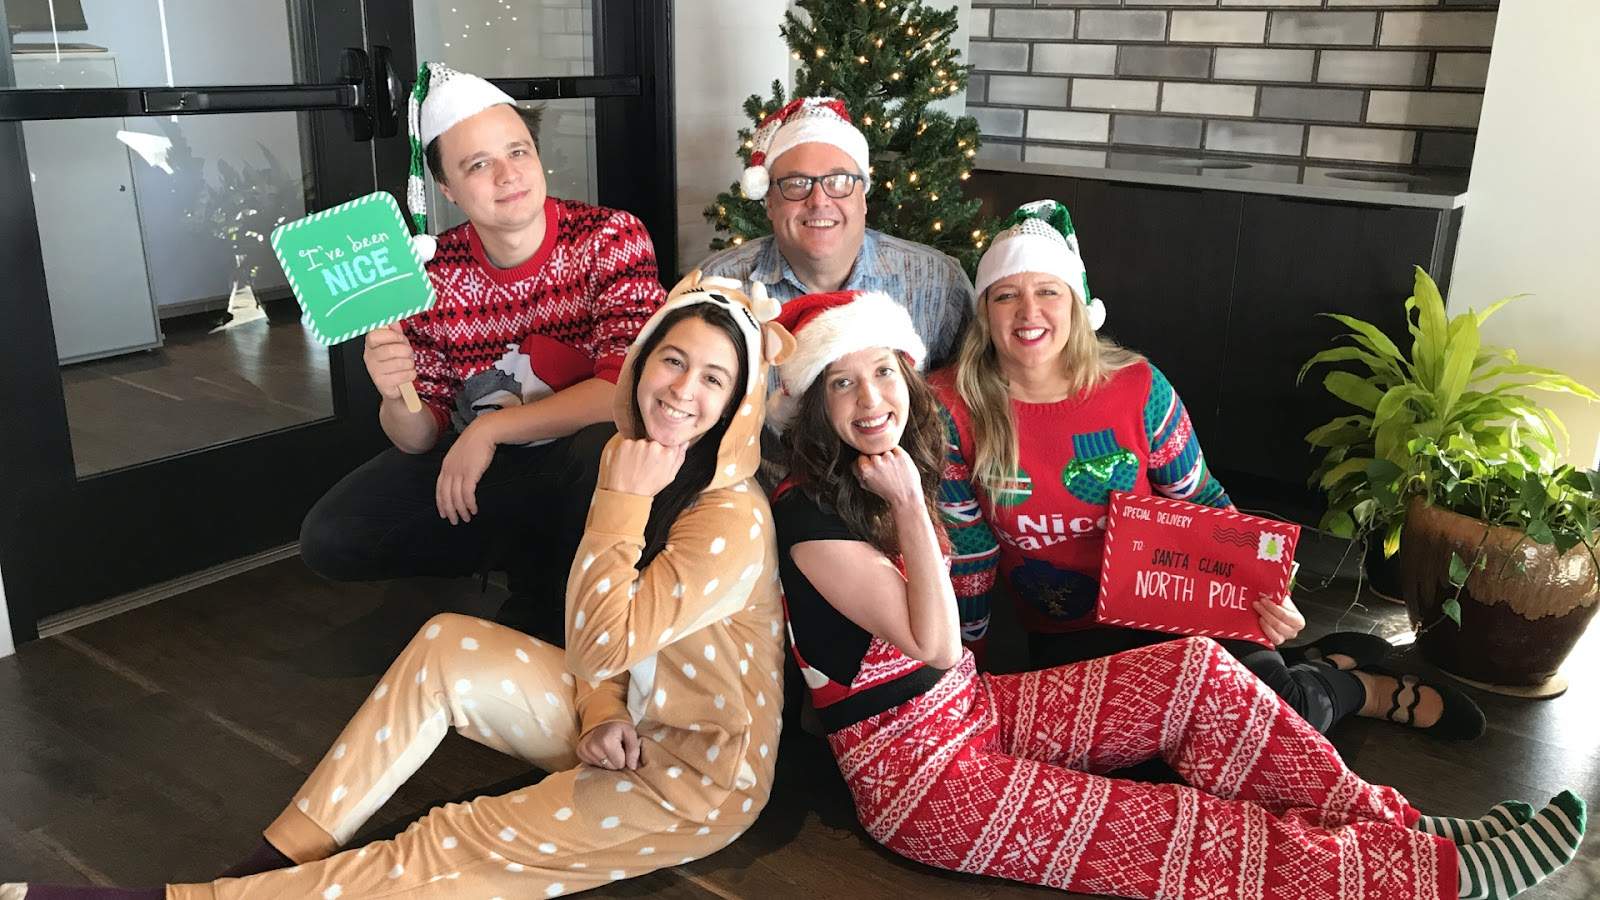 Storyvine team members during Christmas